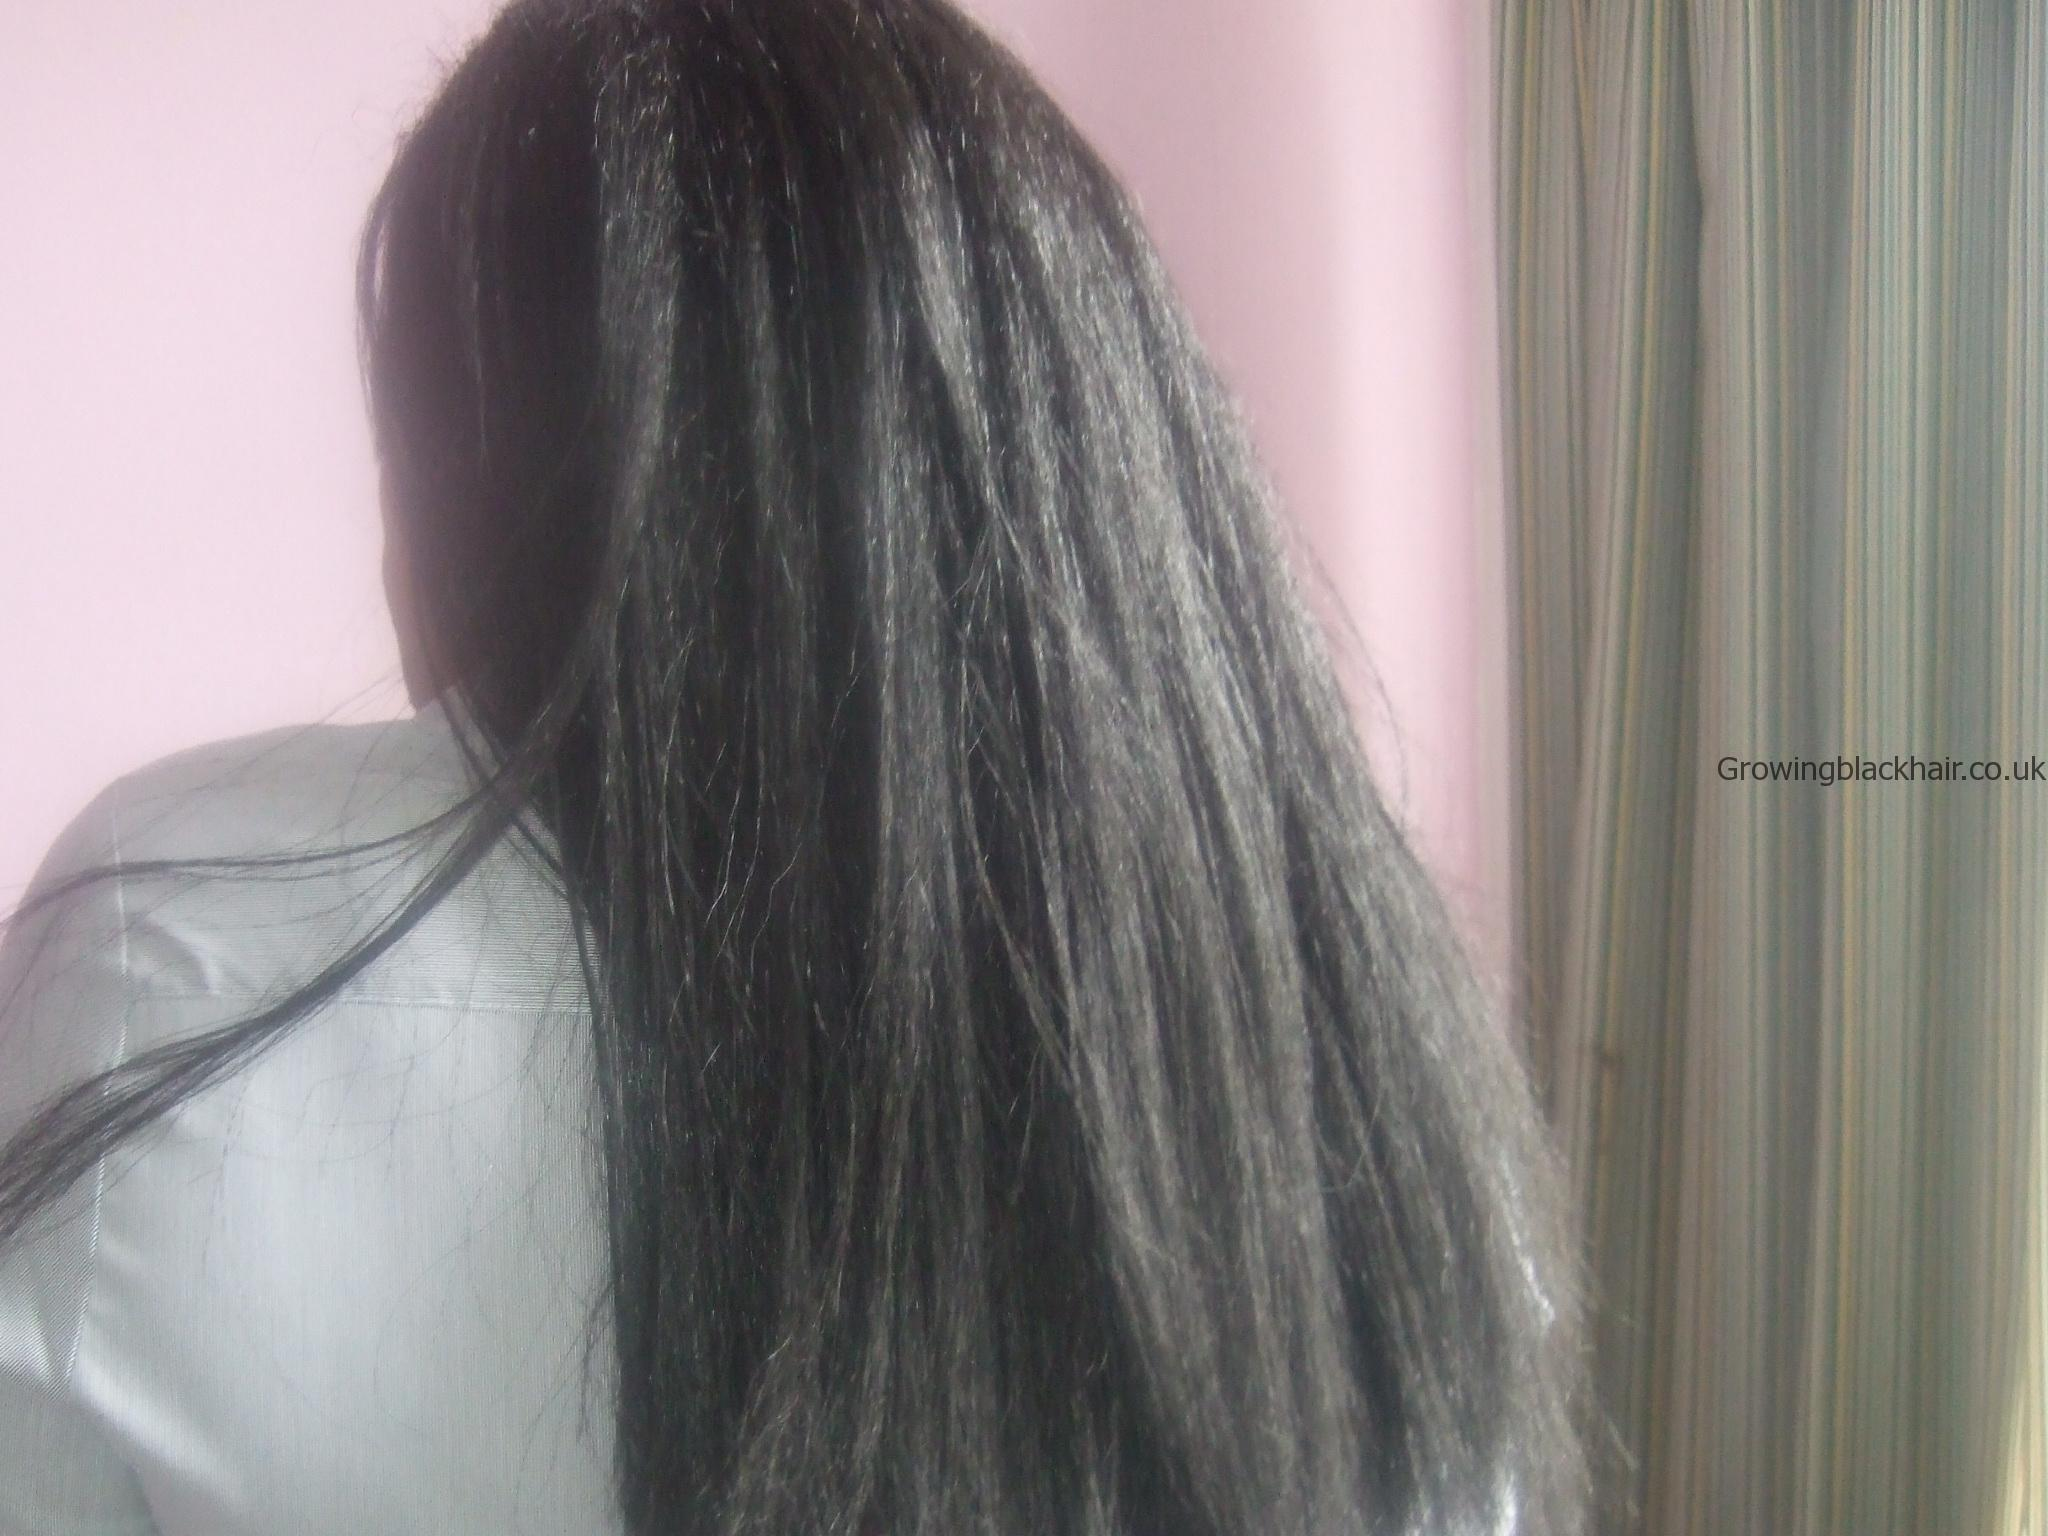 Crochet Braids Hair Growth Results : Black natural hair care - Crochet braids Growing black hair